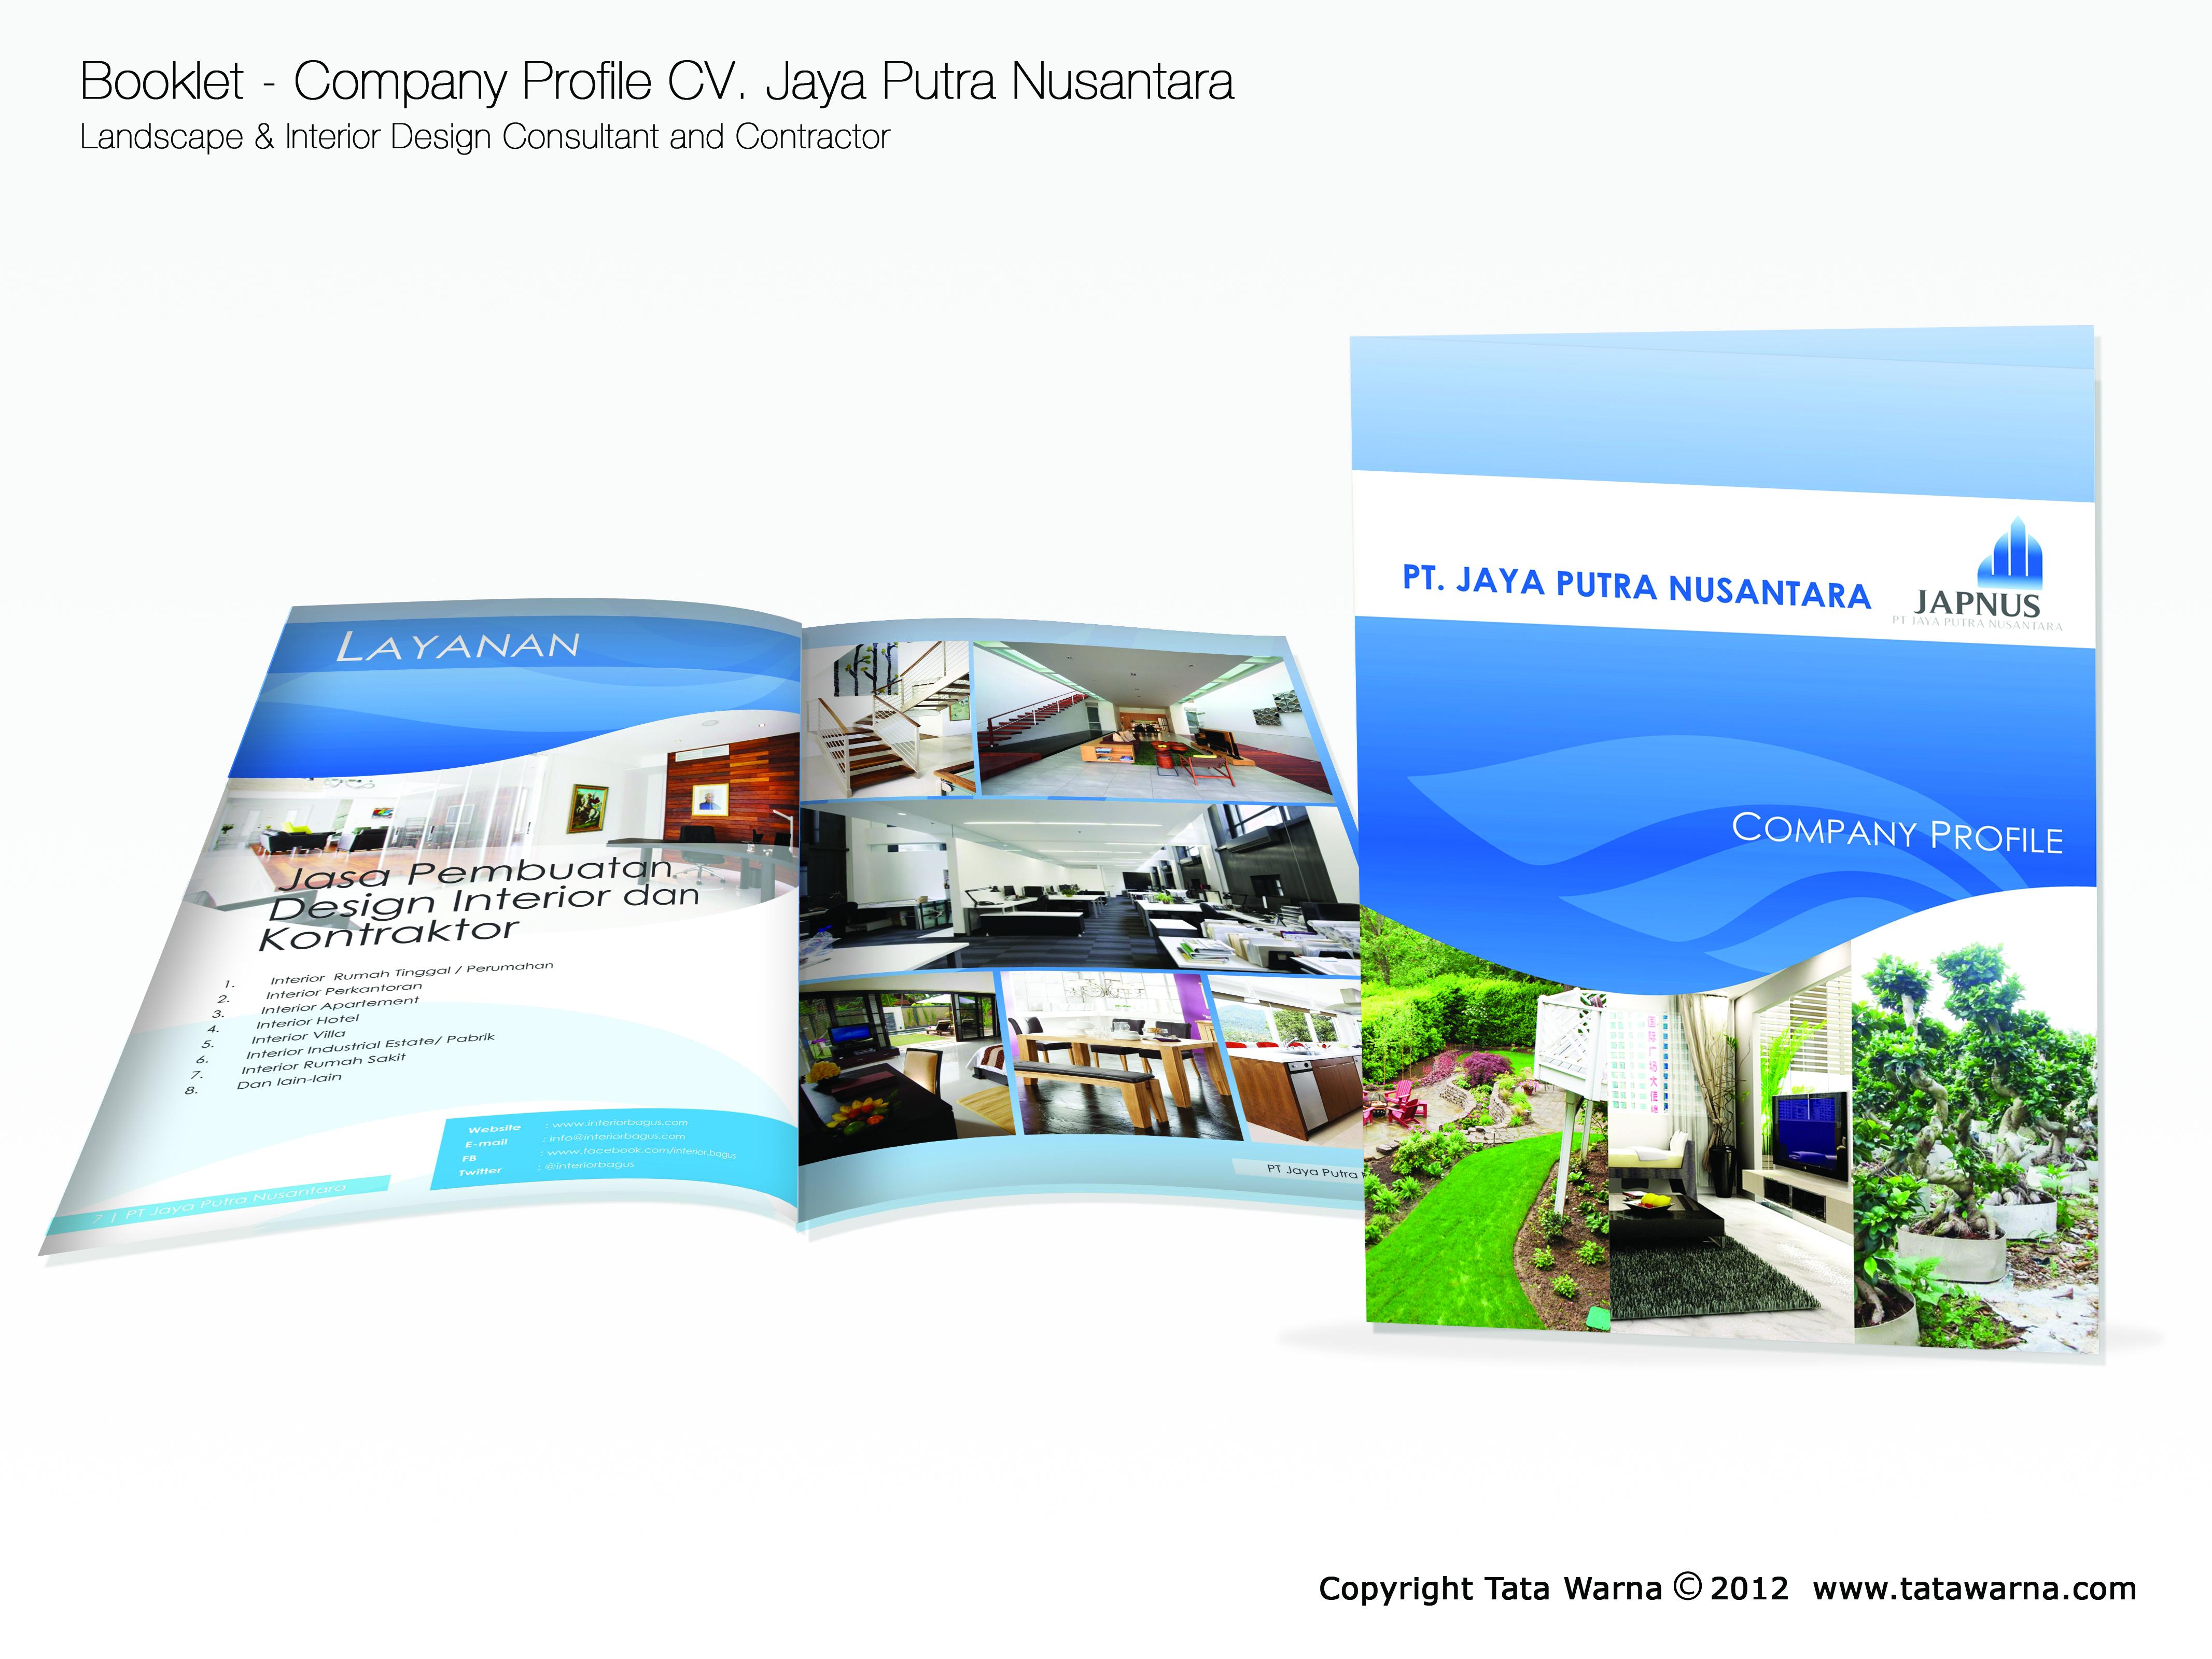 Contoh desain company profile perusahaan bidang landscape for Design consultancy company profile